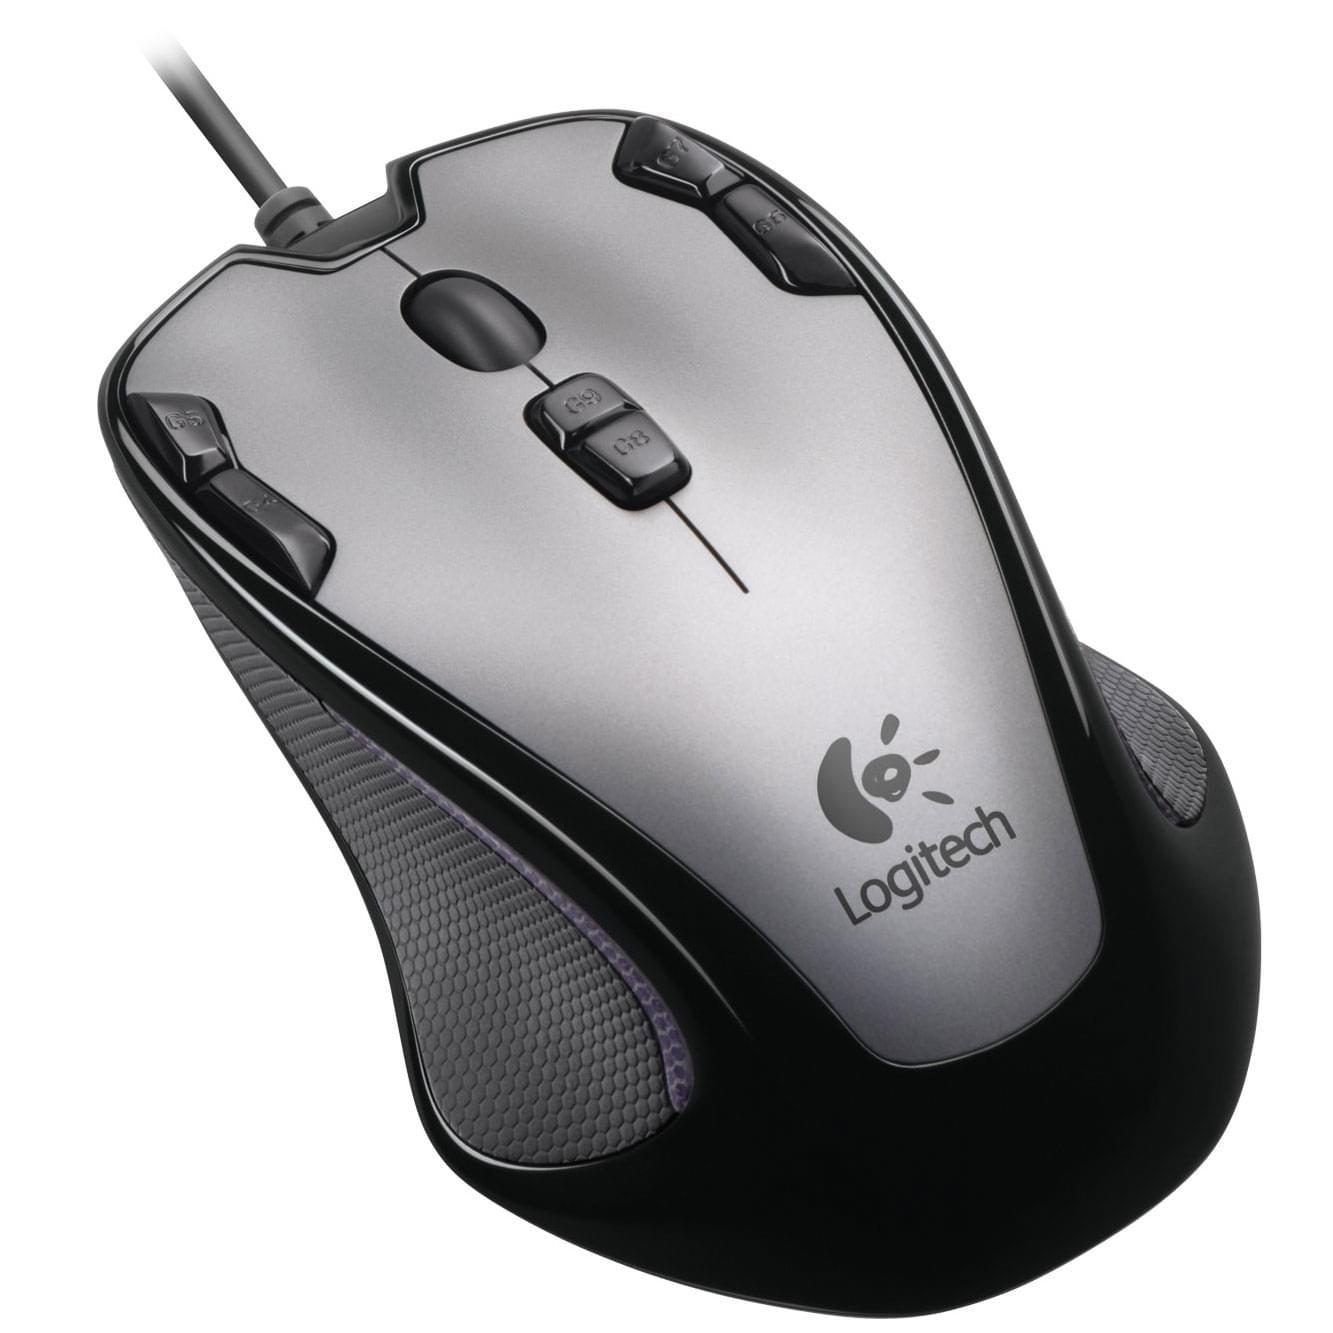 Logitech G300 Gaming Mouse - Souris PC Logitech - Cybertek.fr - 0